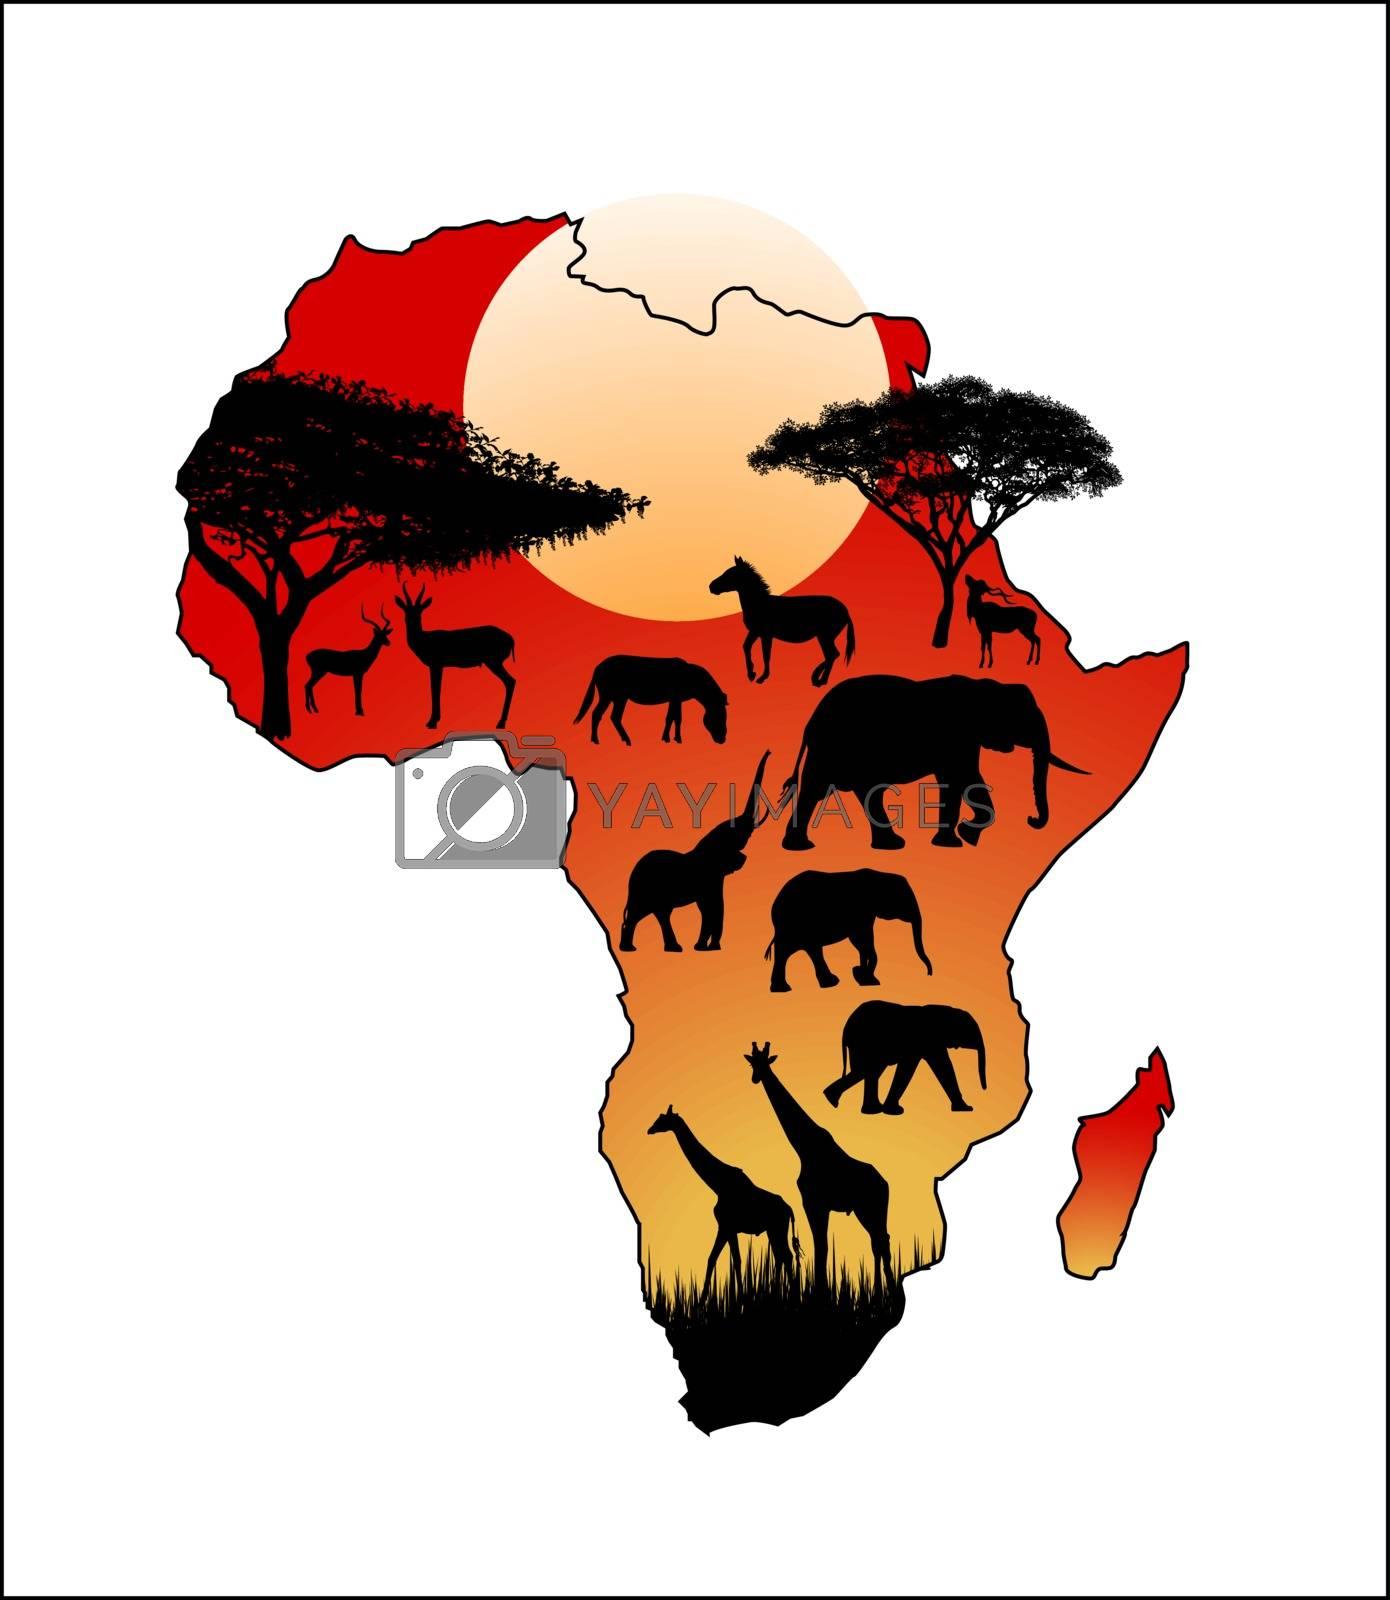 Wild animals on the background of the  African continent. The continent of Africa and wild animals savanna.